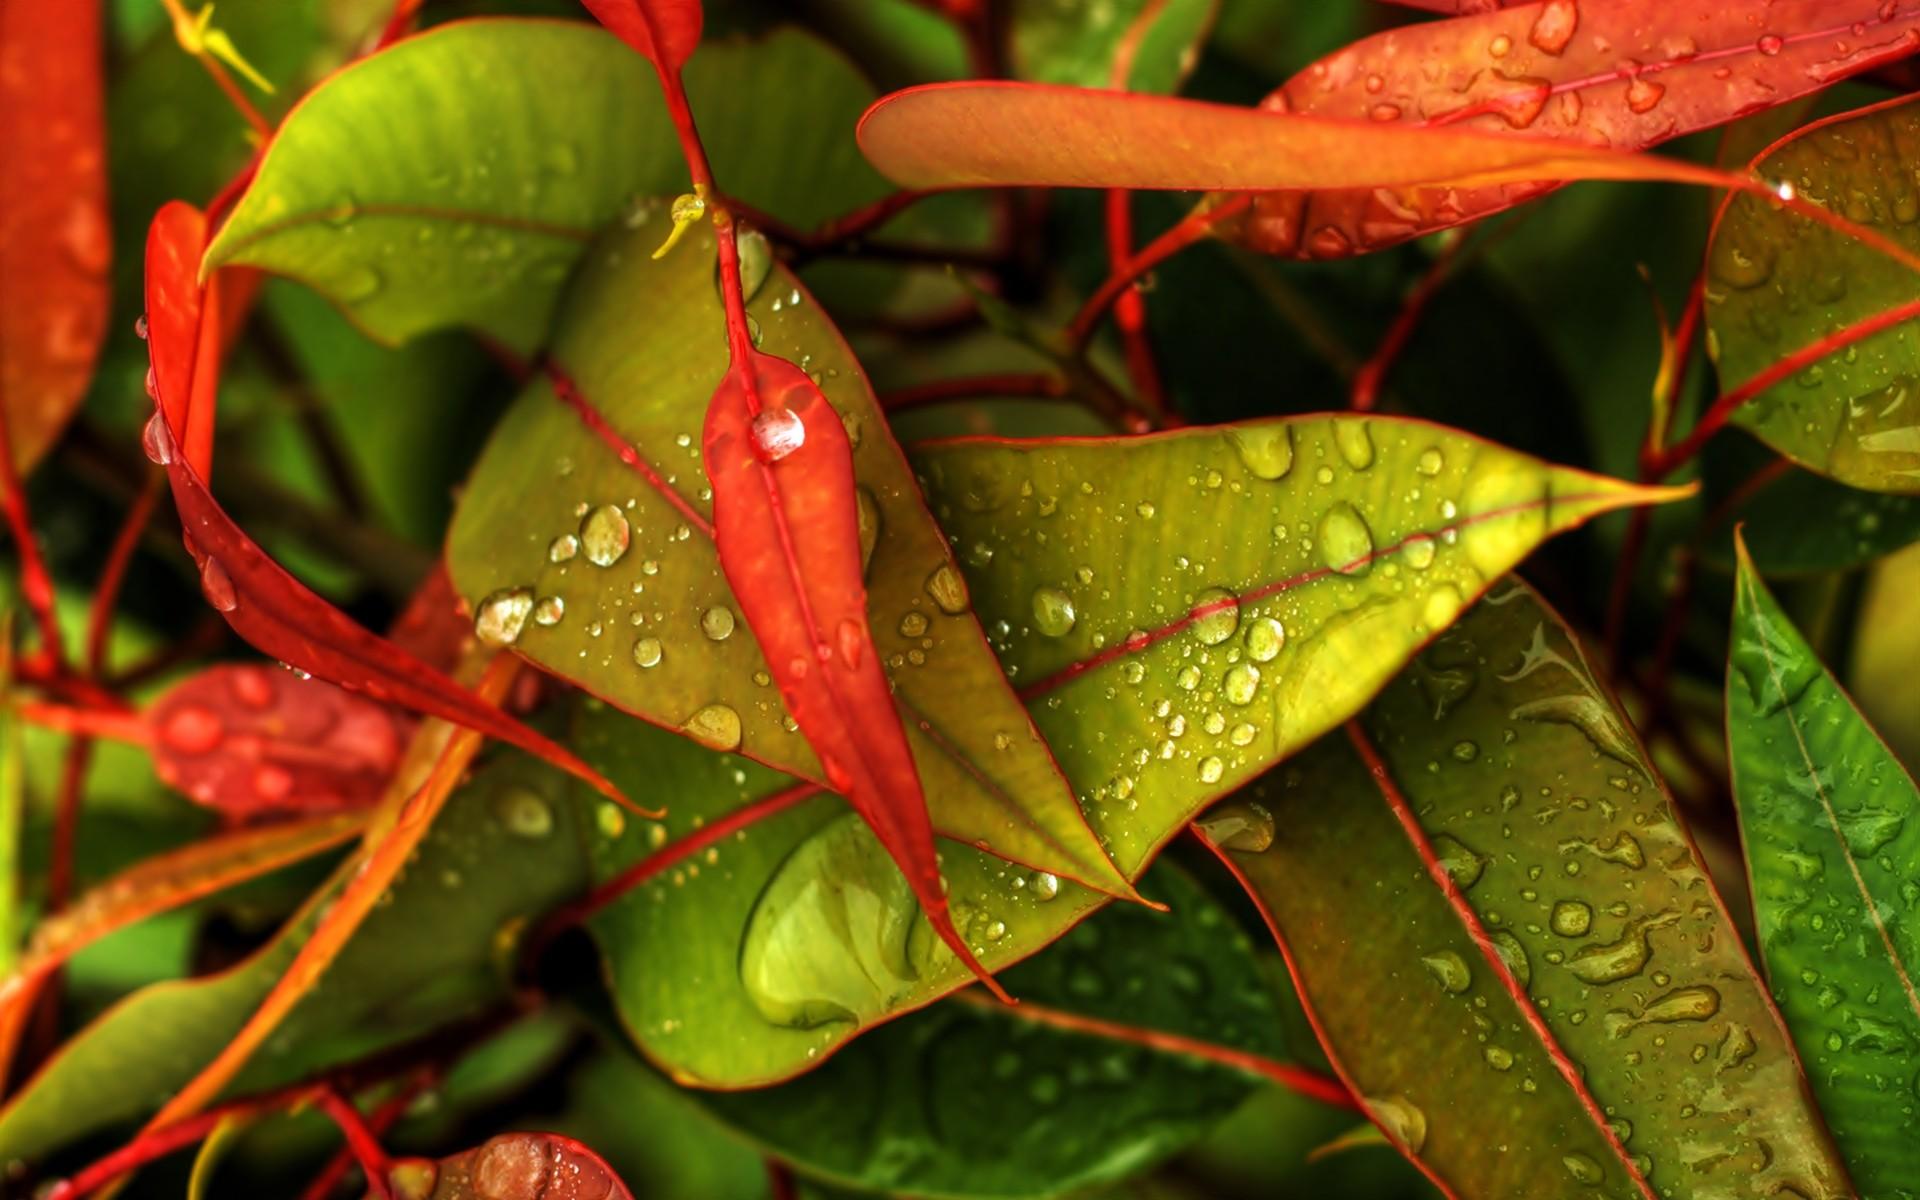 Nechar Wallpaper 3d Leaves Colorful Hd Desktop Wallpapers 4k Hd